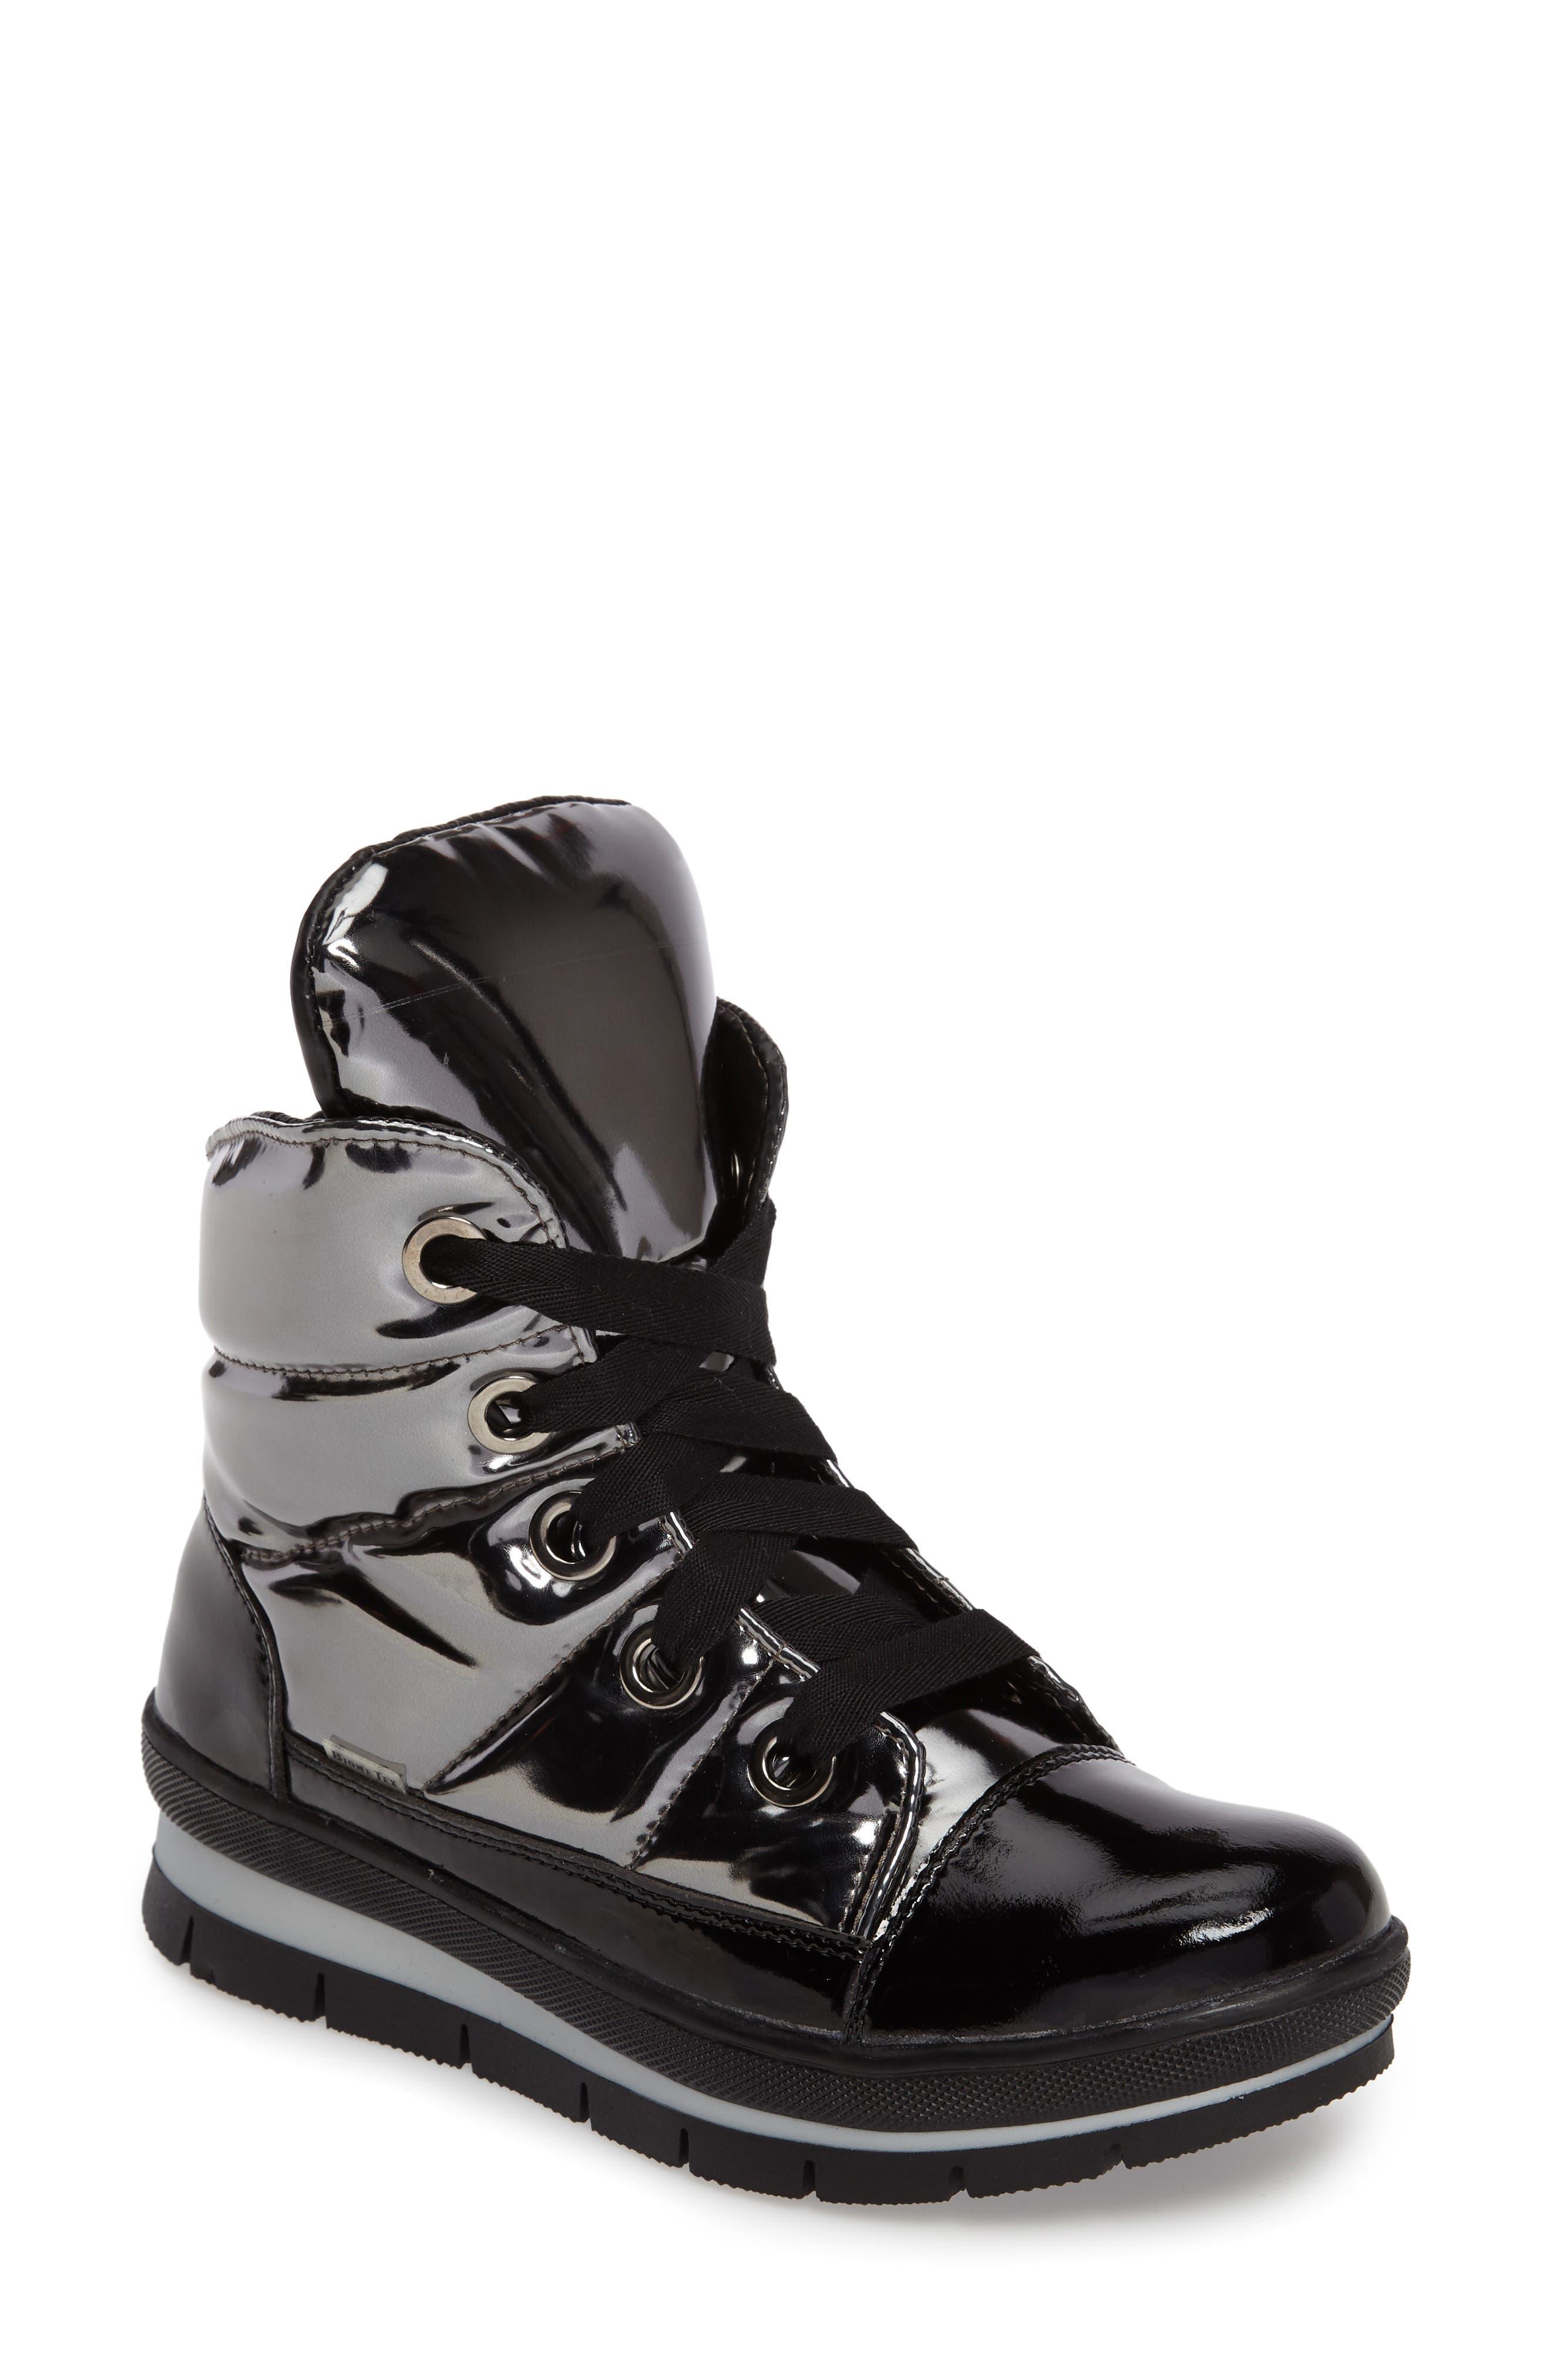 JOG DOG Waterproof Quilted Black & Gold Sneaker